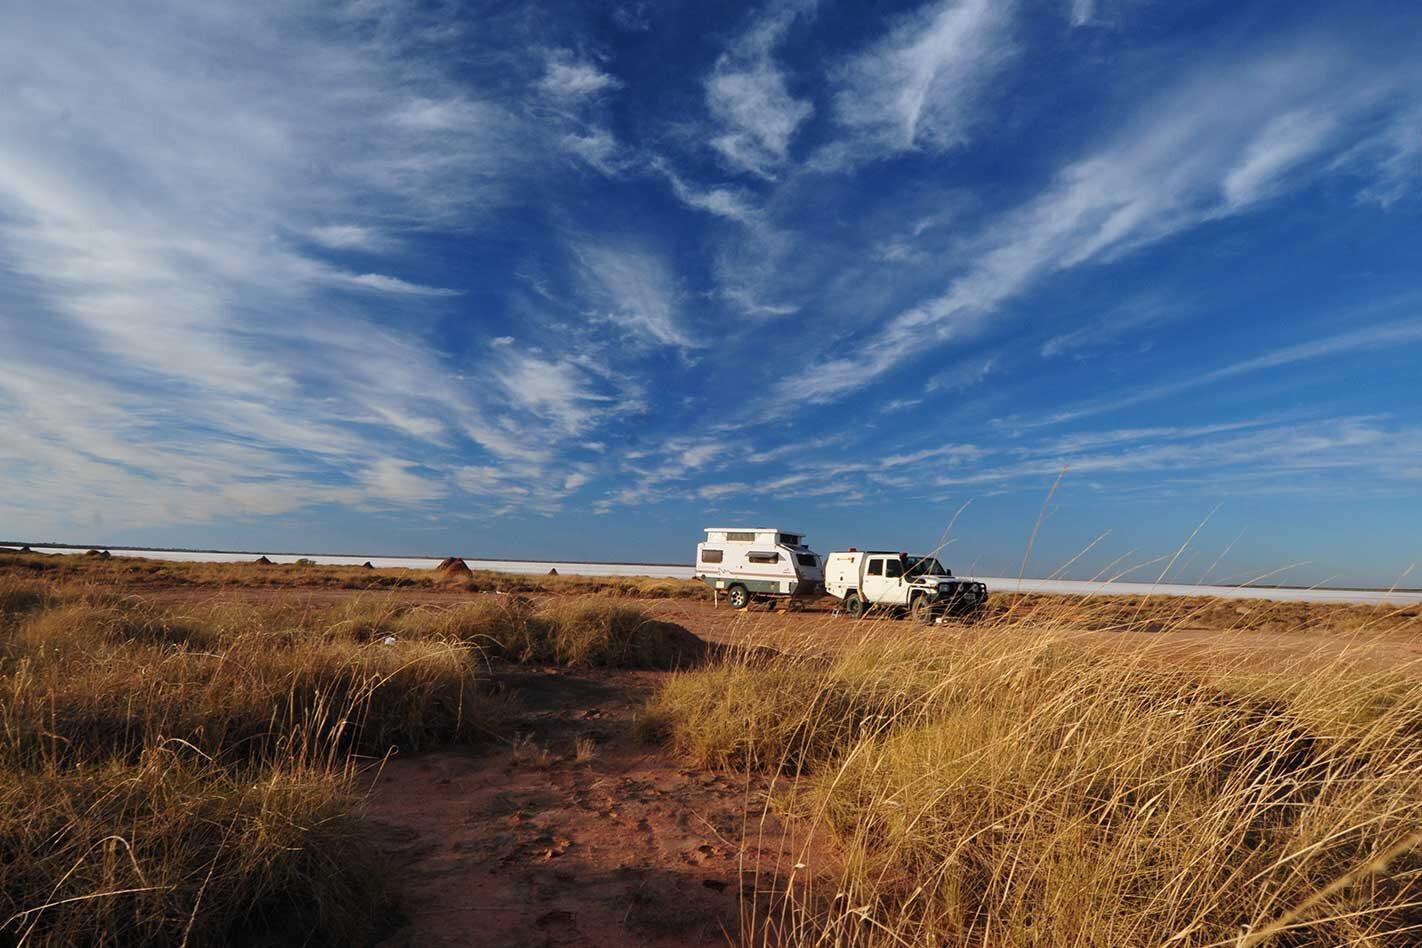 WA Great Sandy Desert 4x4 trip guide